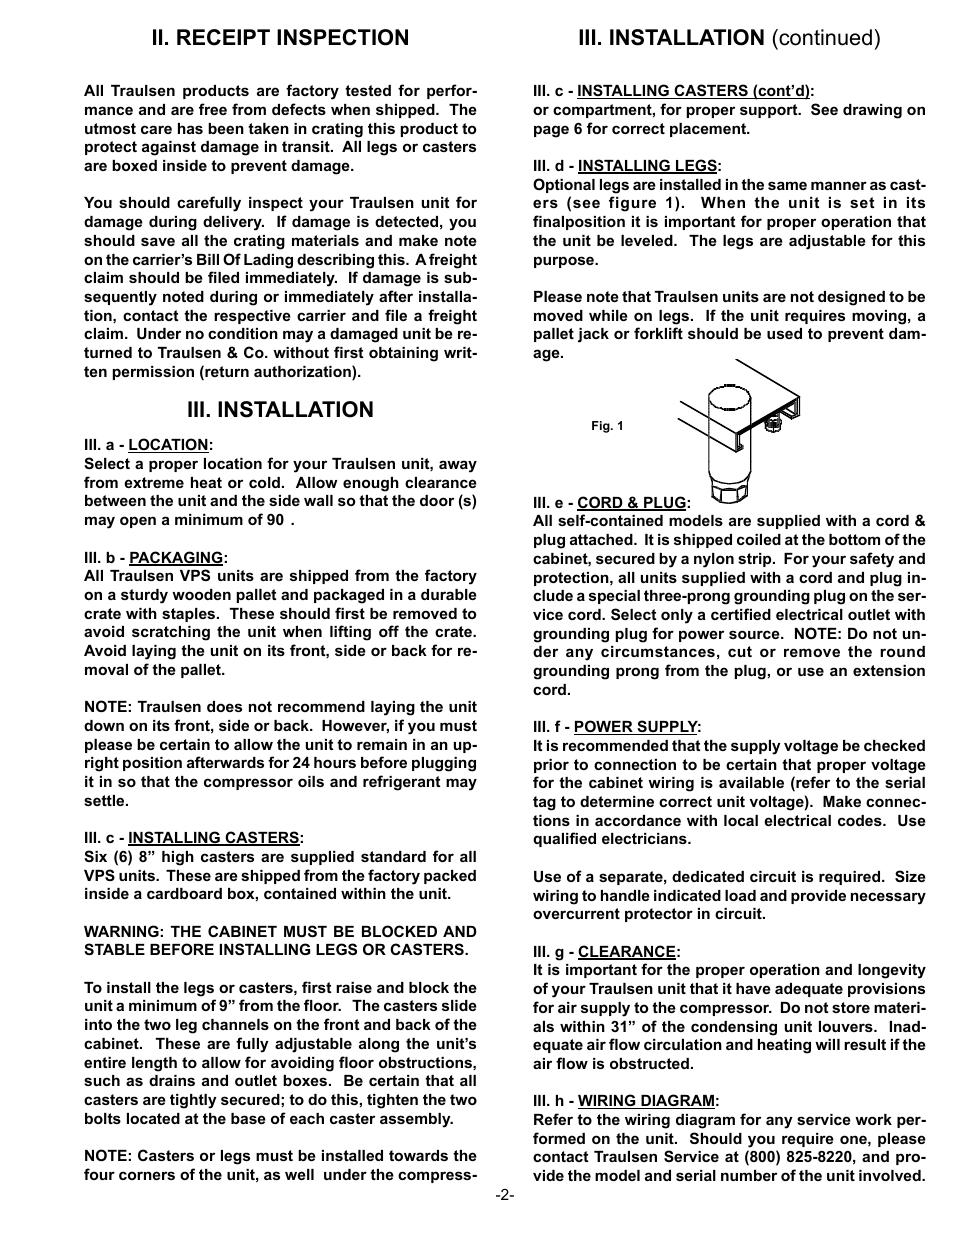 Traulsen vps48s wiring diagram wire center ii receipt inspection iii installation iii installation rh manualsdir com traulsen refrigeration parts breakdown traulsen refrigerator cheapraybanclubmaster Images